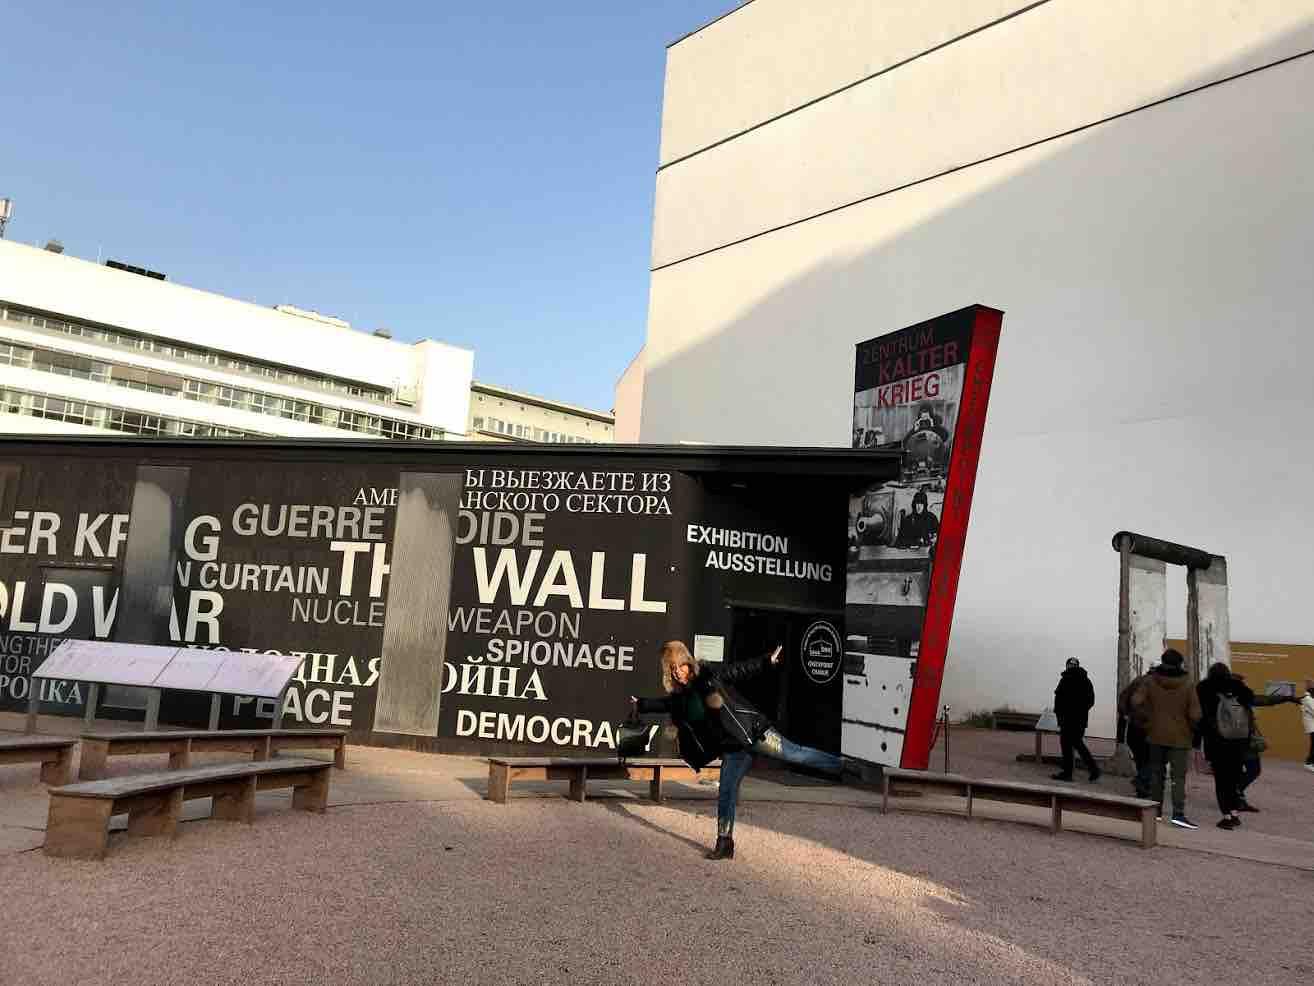 WallMuseumIMG_0376.jpg